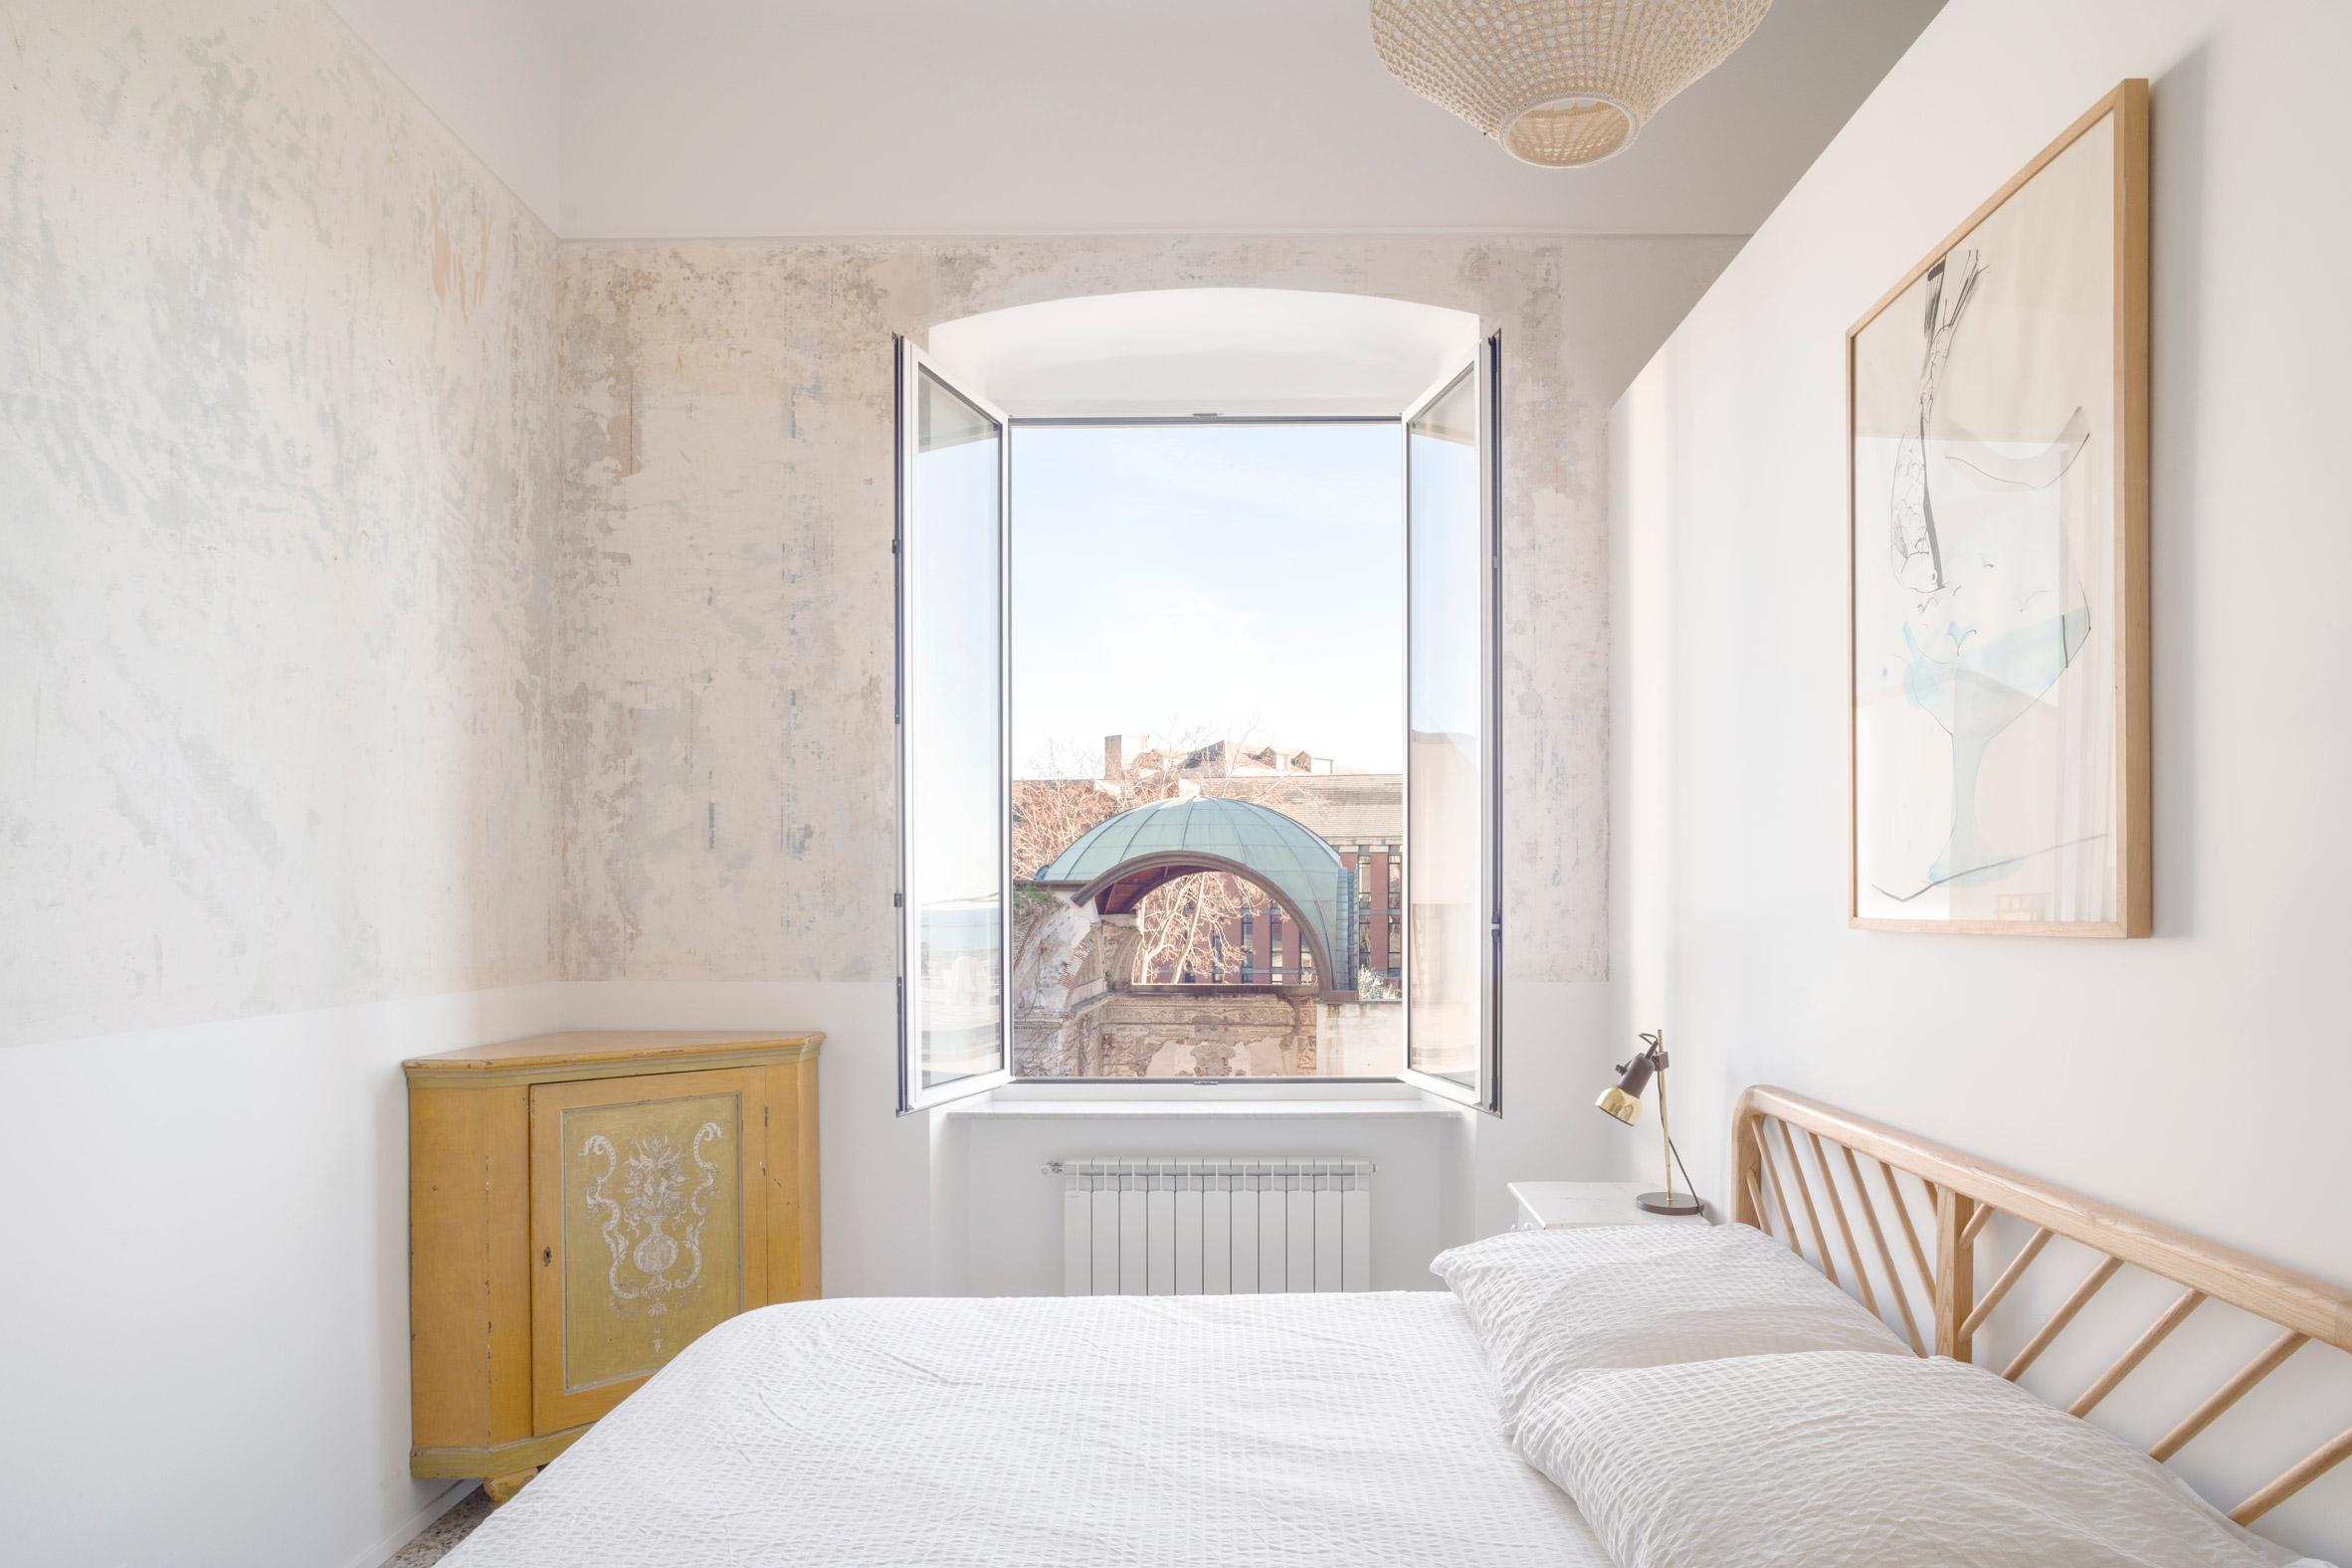 Bedroom in Casa ai Bailucchi by llabb